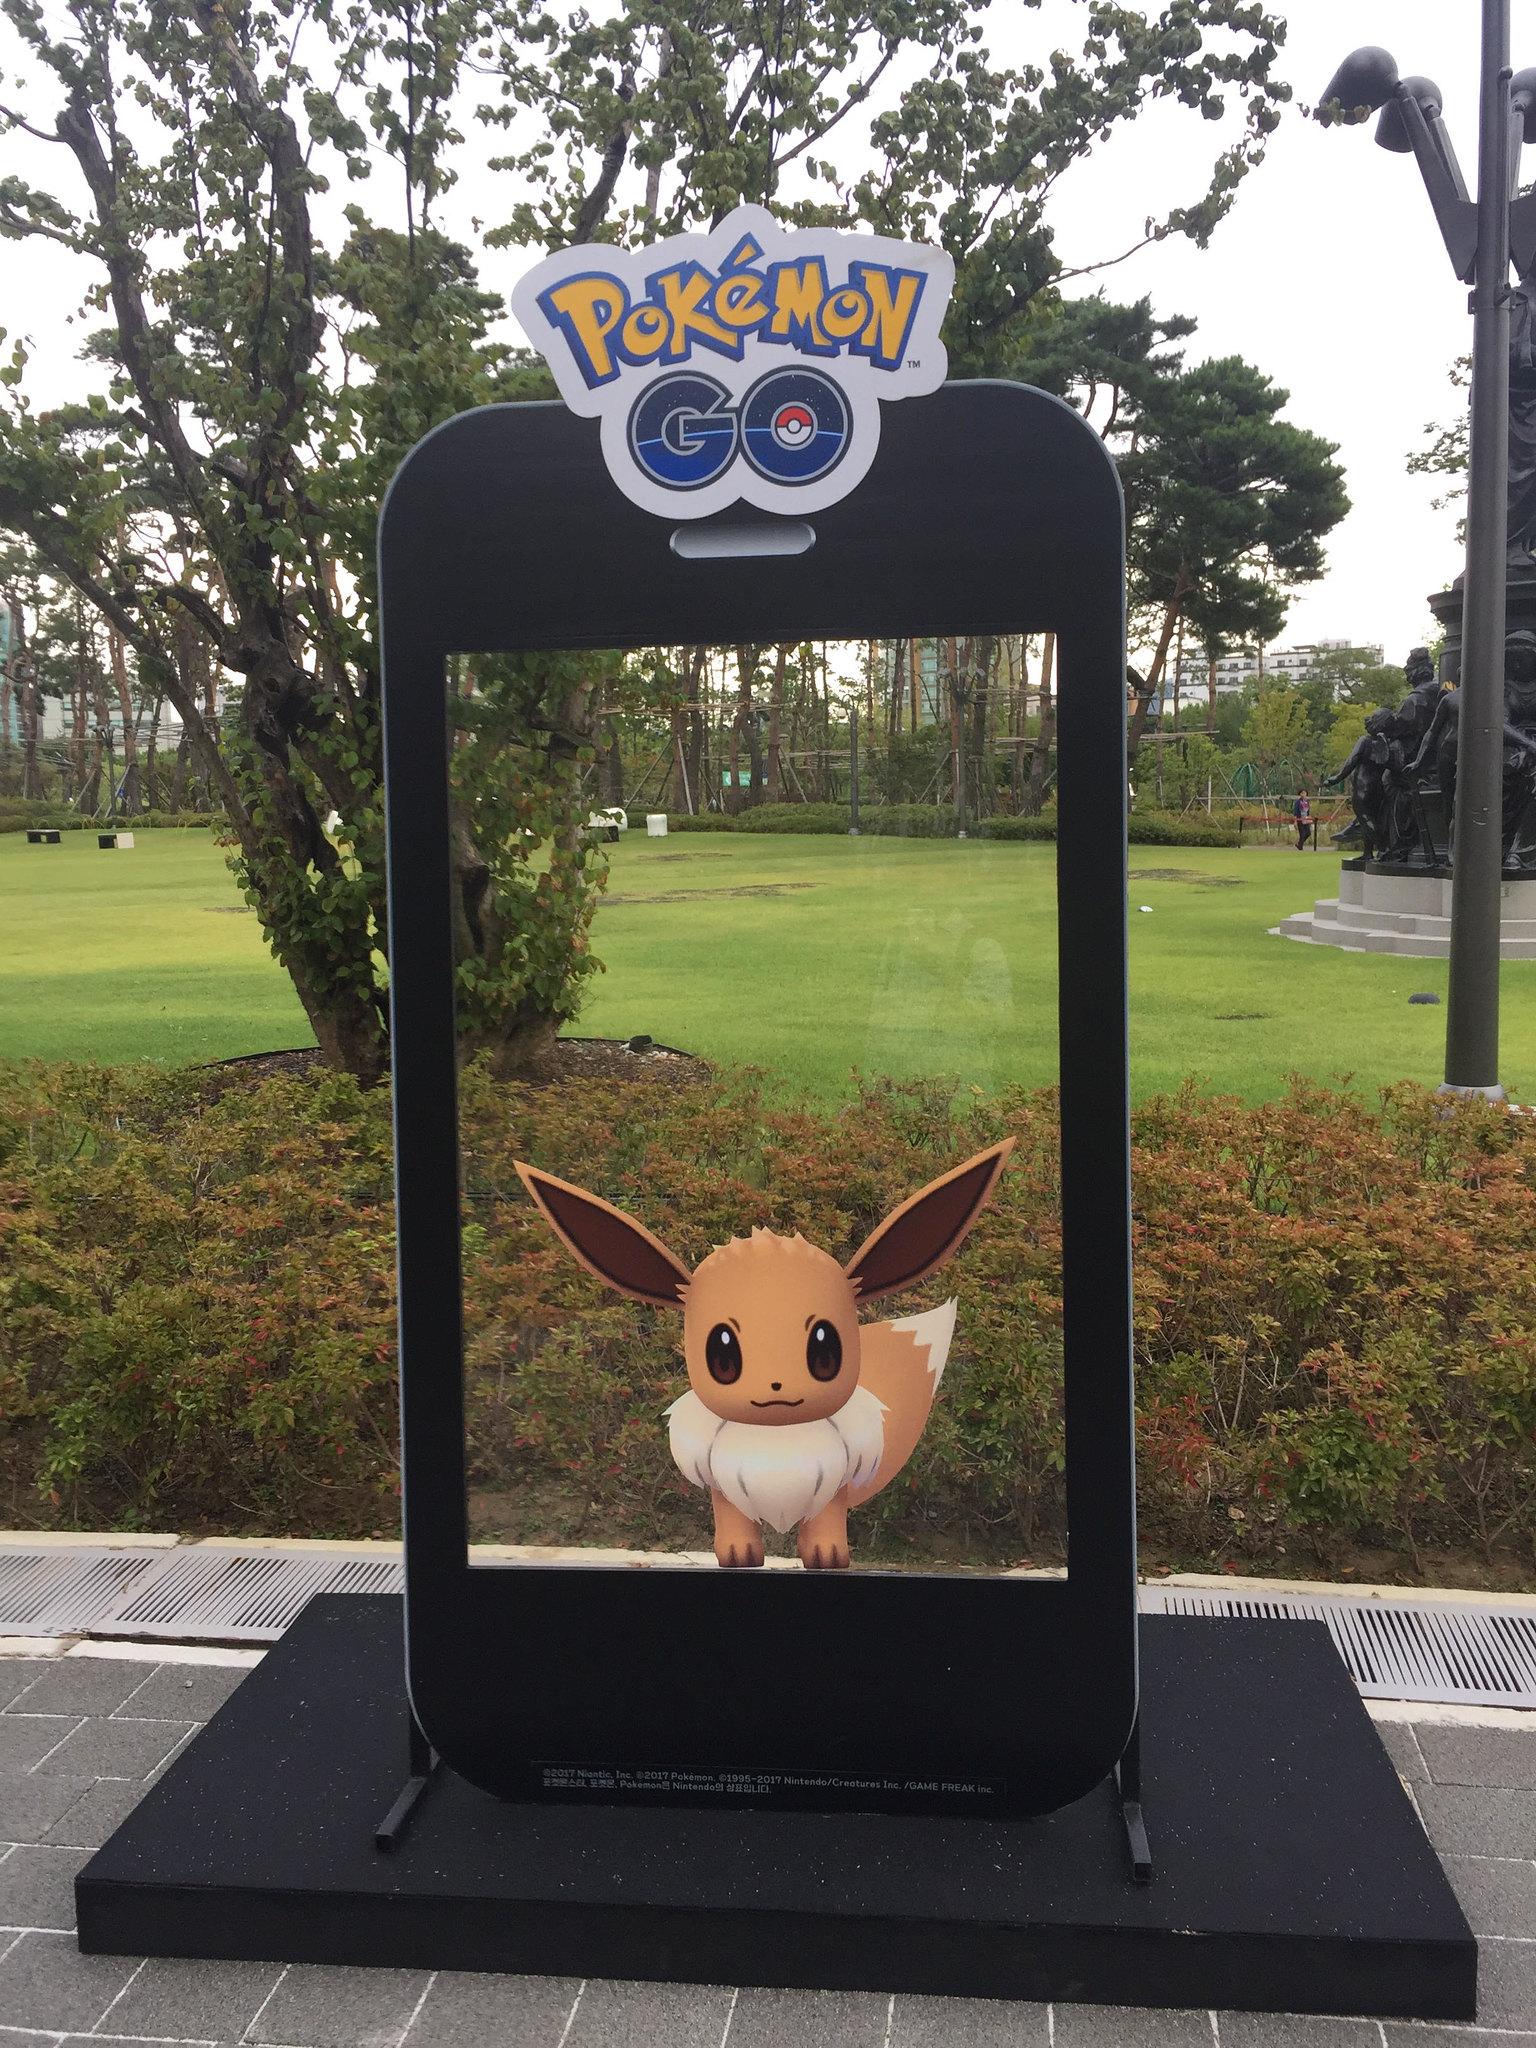 keb_hana_bank_and_sk_telecom_pokemon_go_week_at_pokemon_fest_2018_eevee